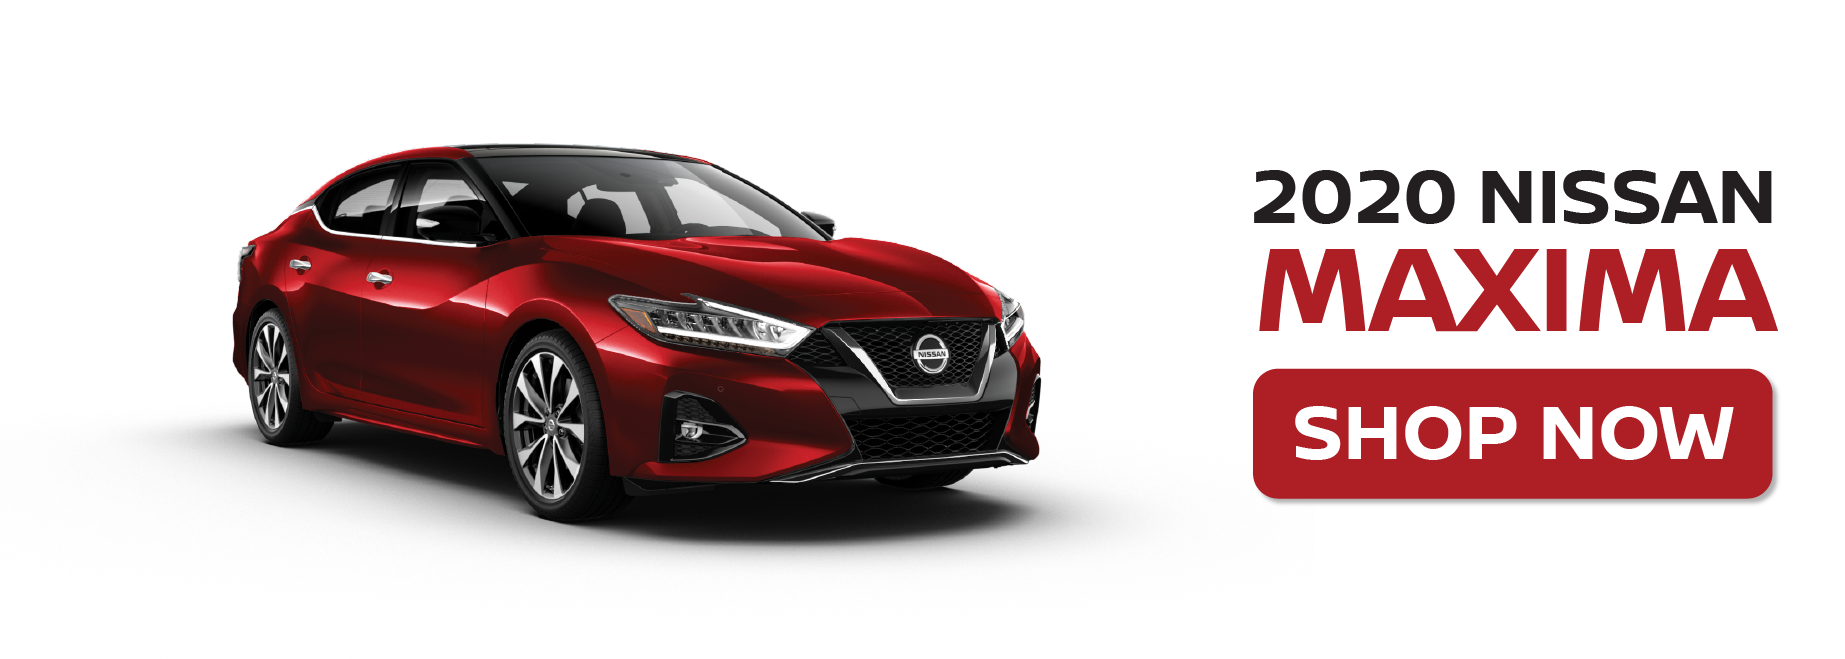 Nissan Maxima For Sale Katy, TX